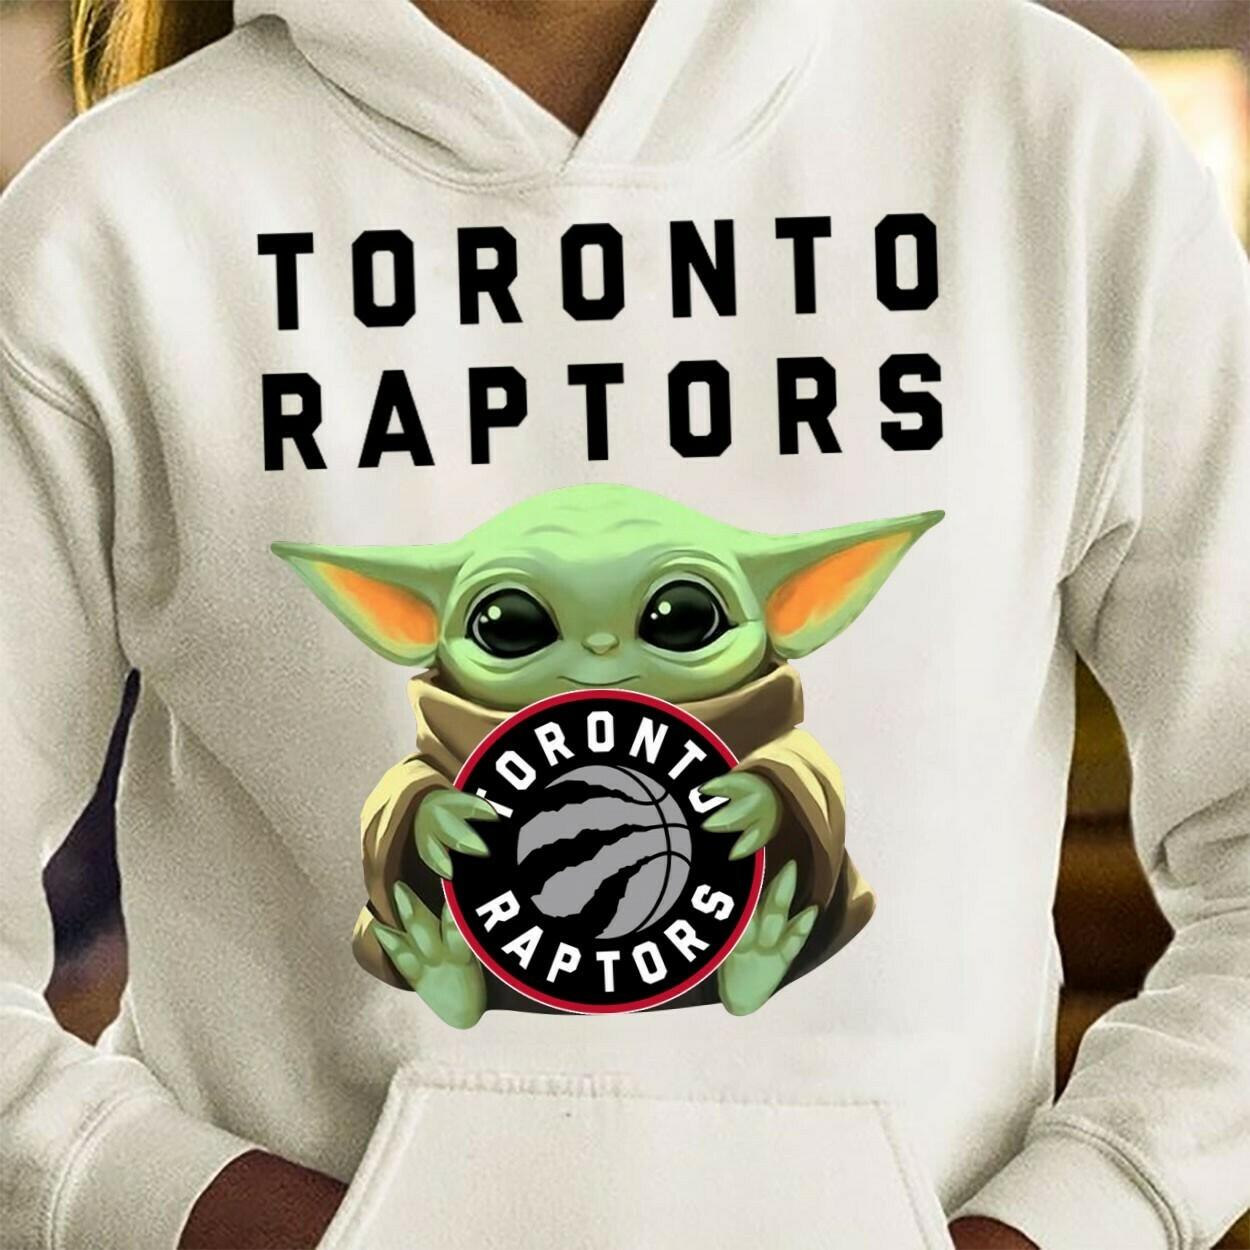 Toronto Raptors Baby Yoda Star Wars The Mandalorian The Child First Memories Floating NBA Basketball Dad Mon Kid Fan Gift T-Shirt Long Sleeve Sweatshirt Hoodie Jolly Family Gifts